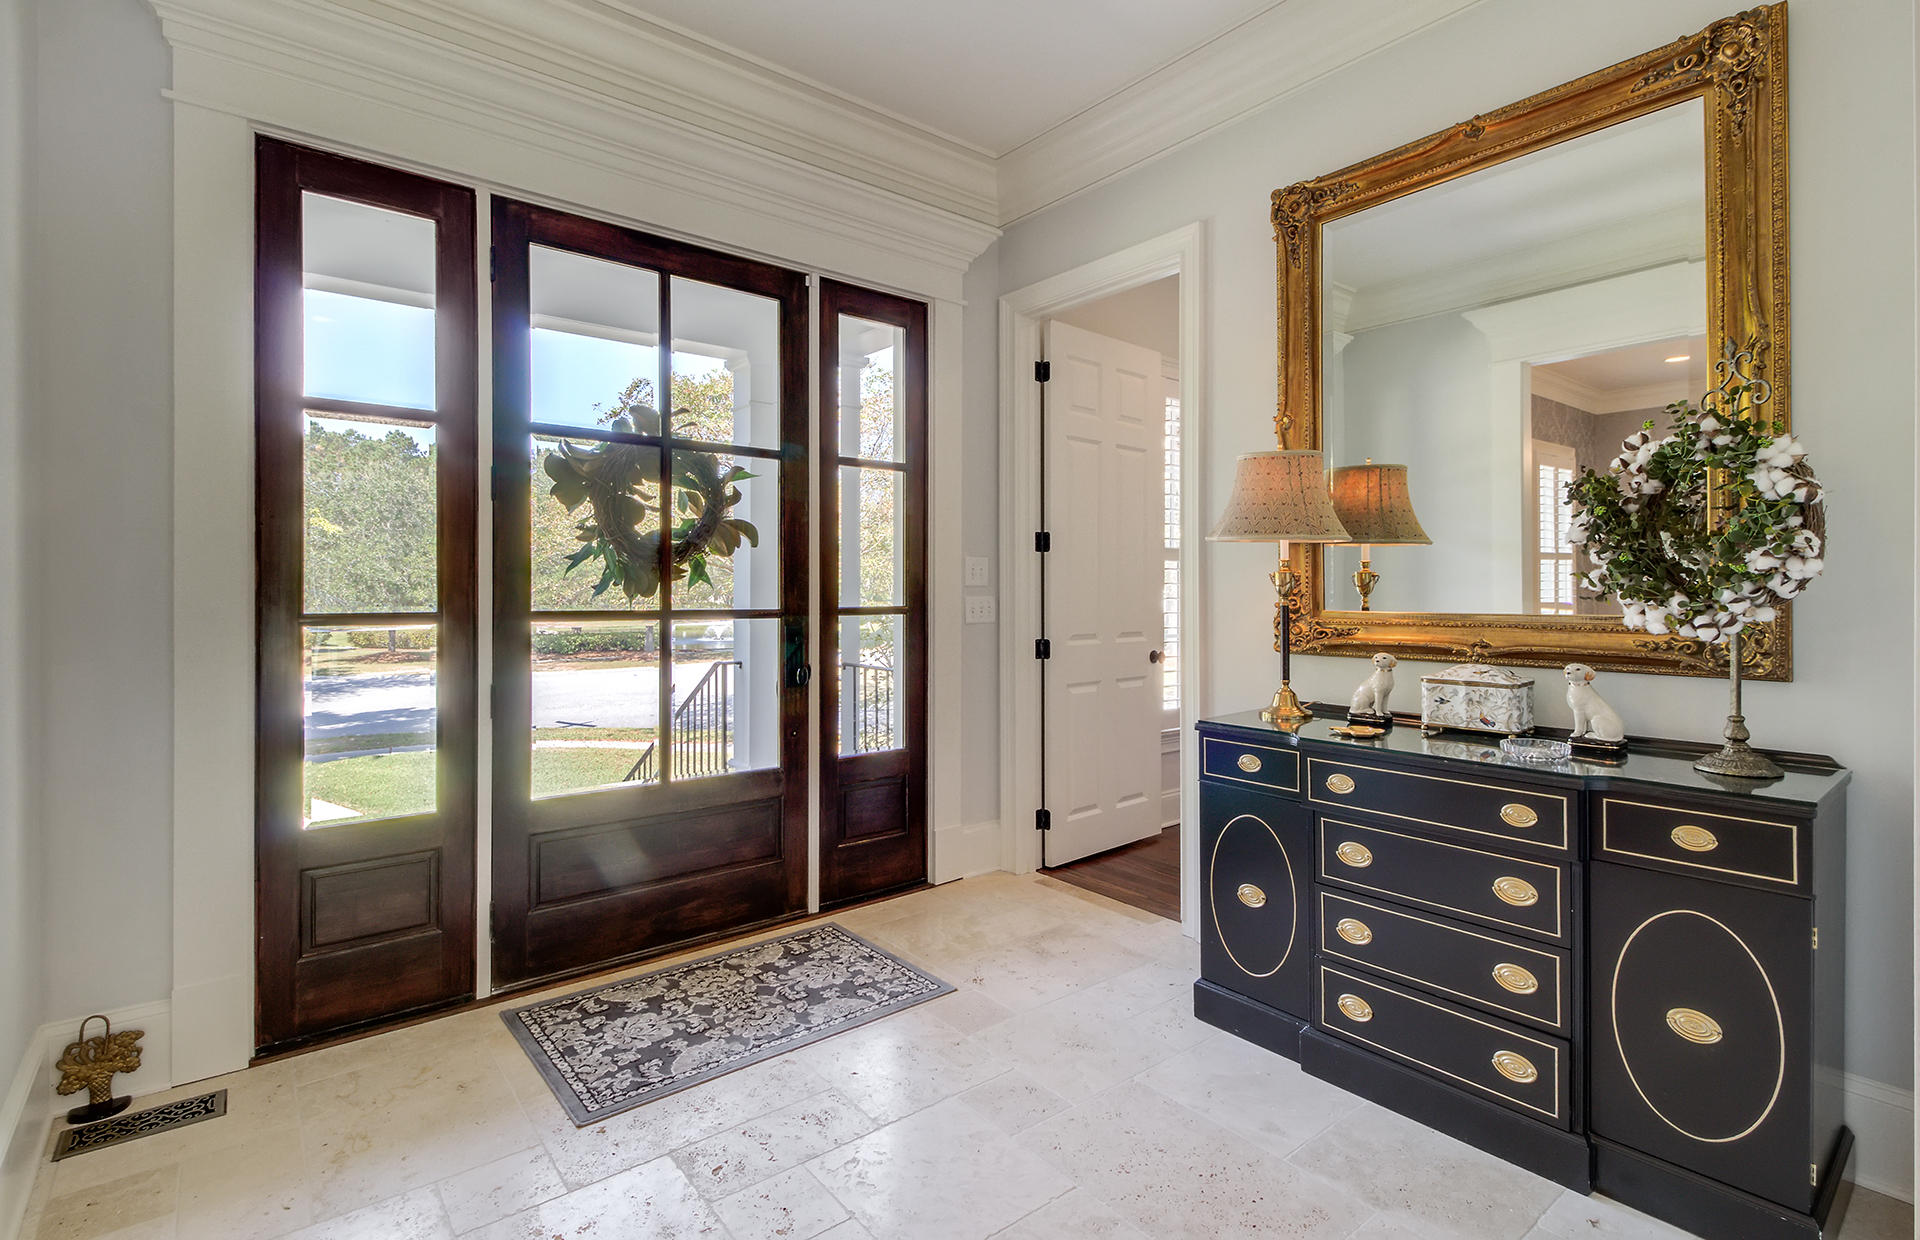 Olde Park Homes For Sale - 770 Olde Central, Mount Pleasant, SC - 79